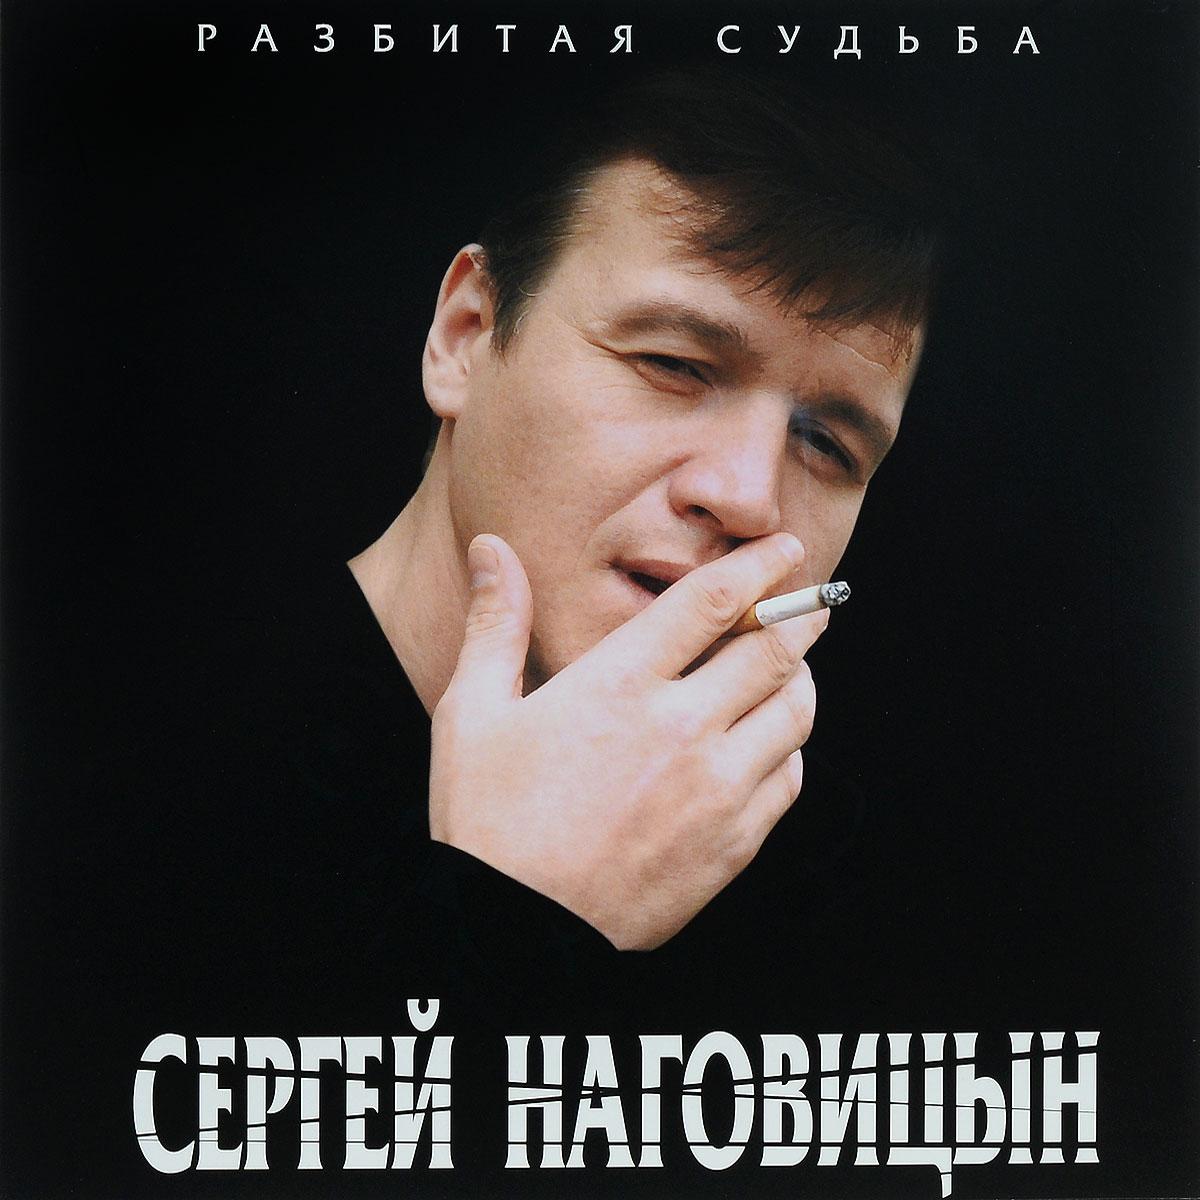 Zakazat.ru: Сергей Наговицын. Разбитая судьба (LP)